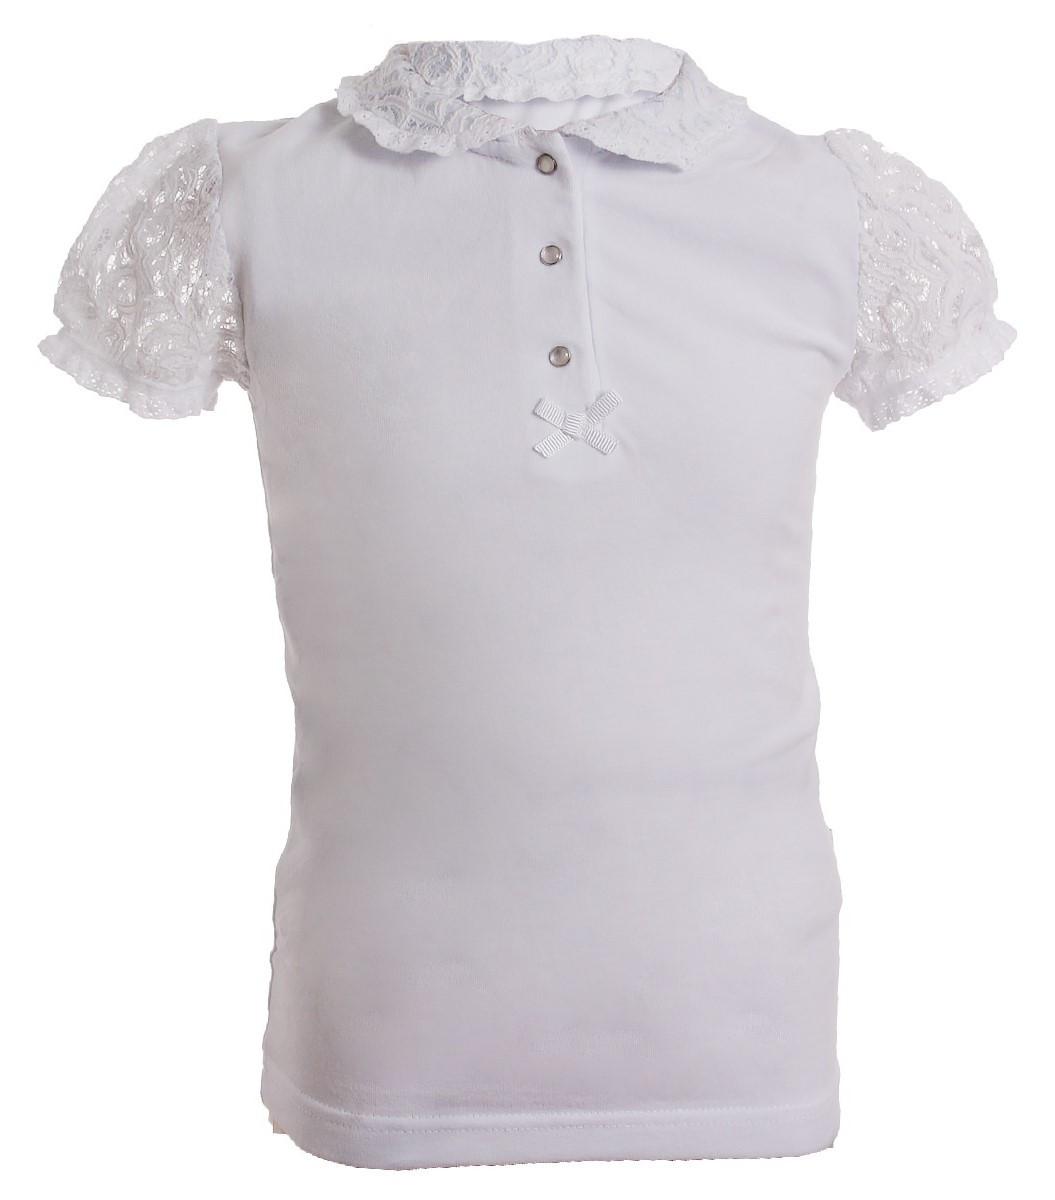 e1d5a3fcdf2 Школьная трикотажная блузка тм Smil с коротким рукавом р-р 116 ...